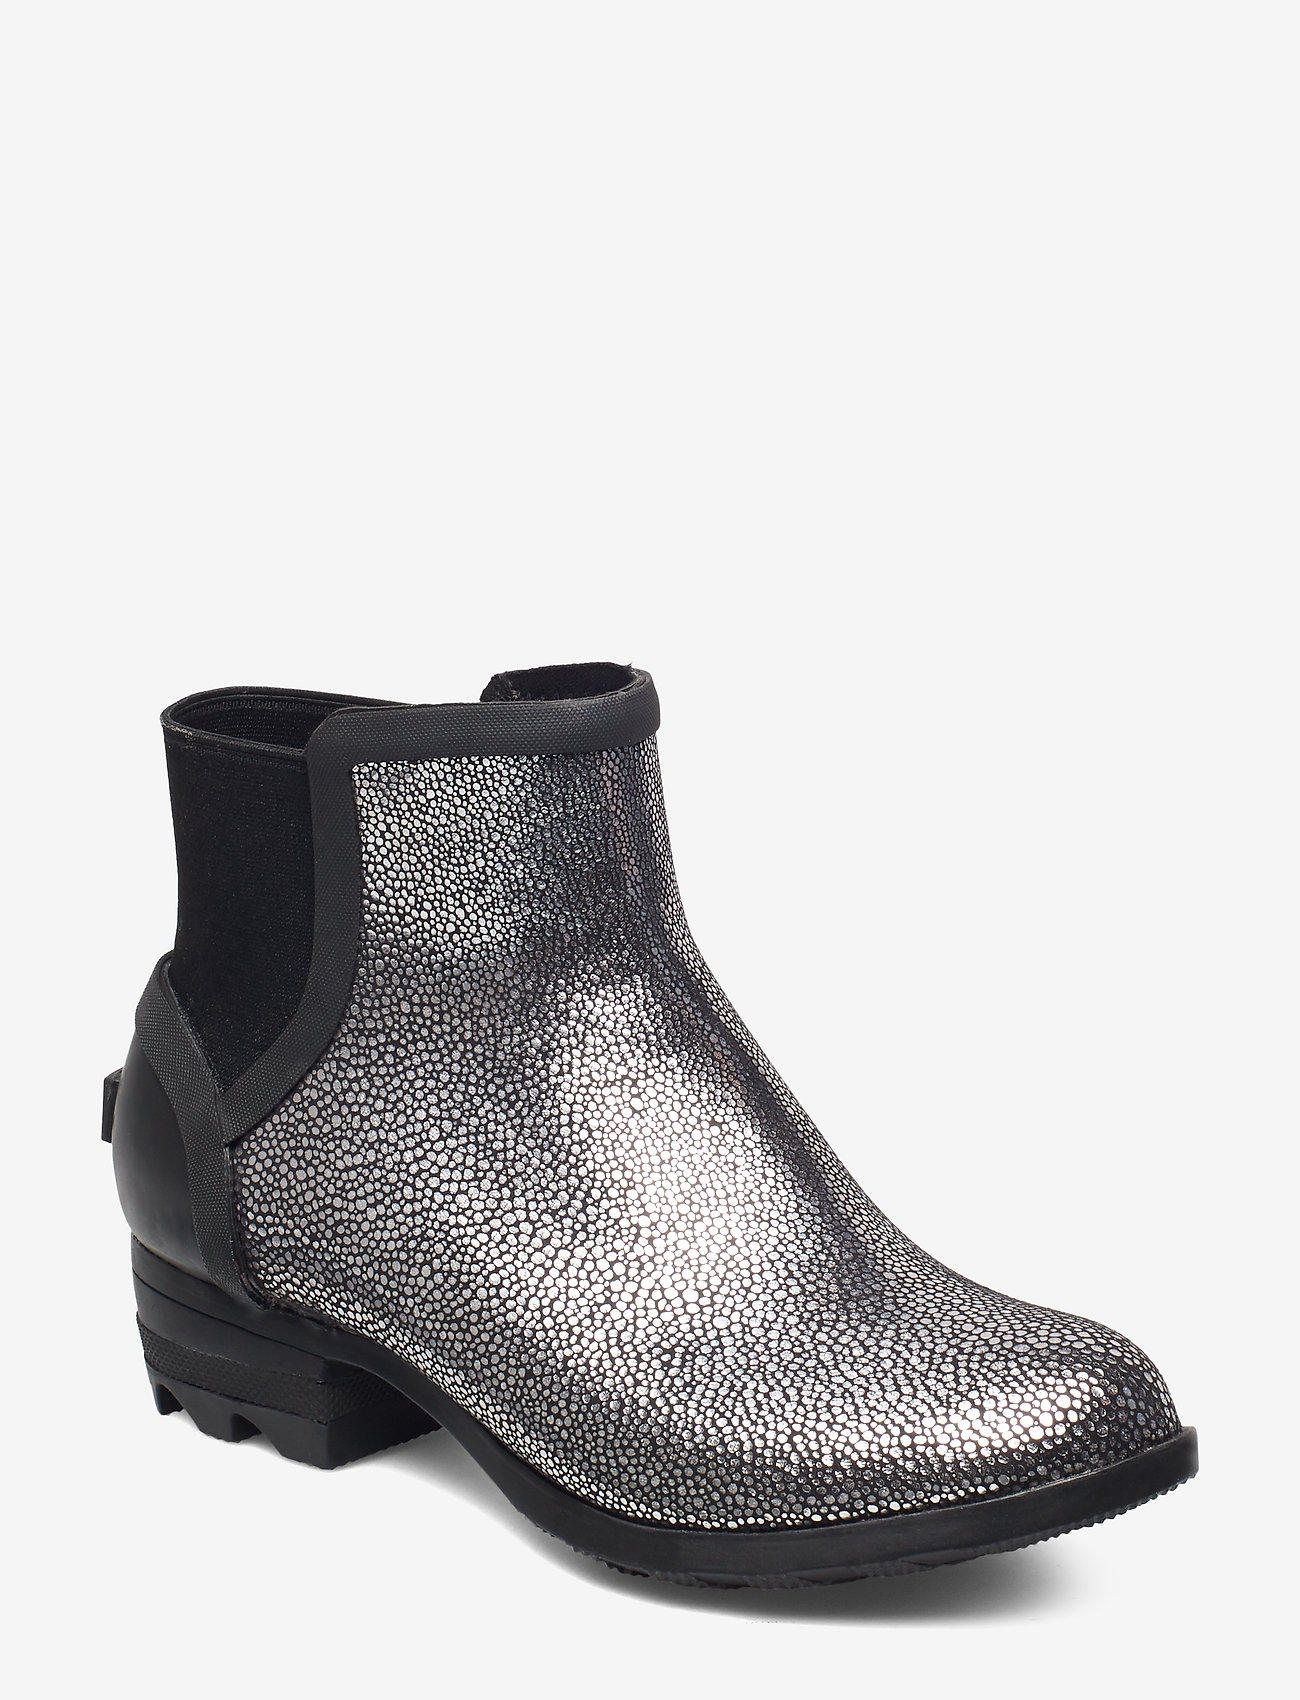 Sorel - JANEY CHELSEA- Metallic - bottes de pluie - black, pure silver - 0